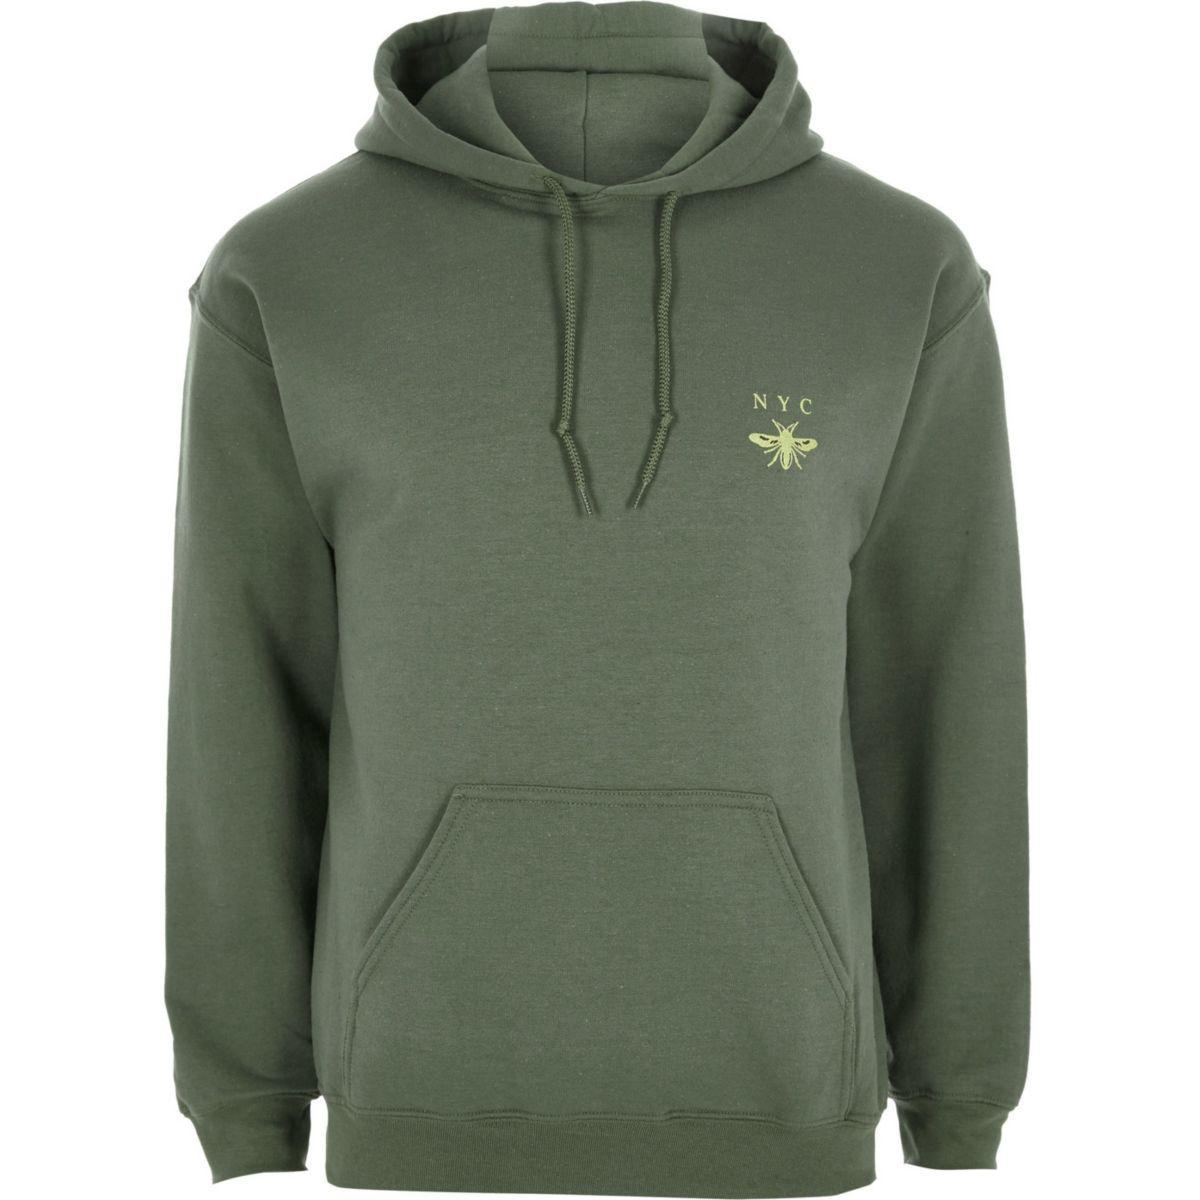 River Island New York Sweatshirt